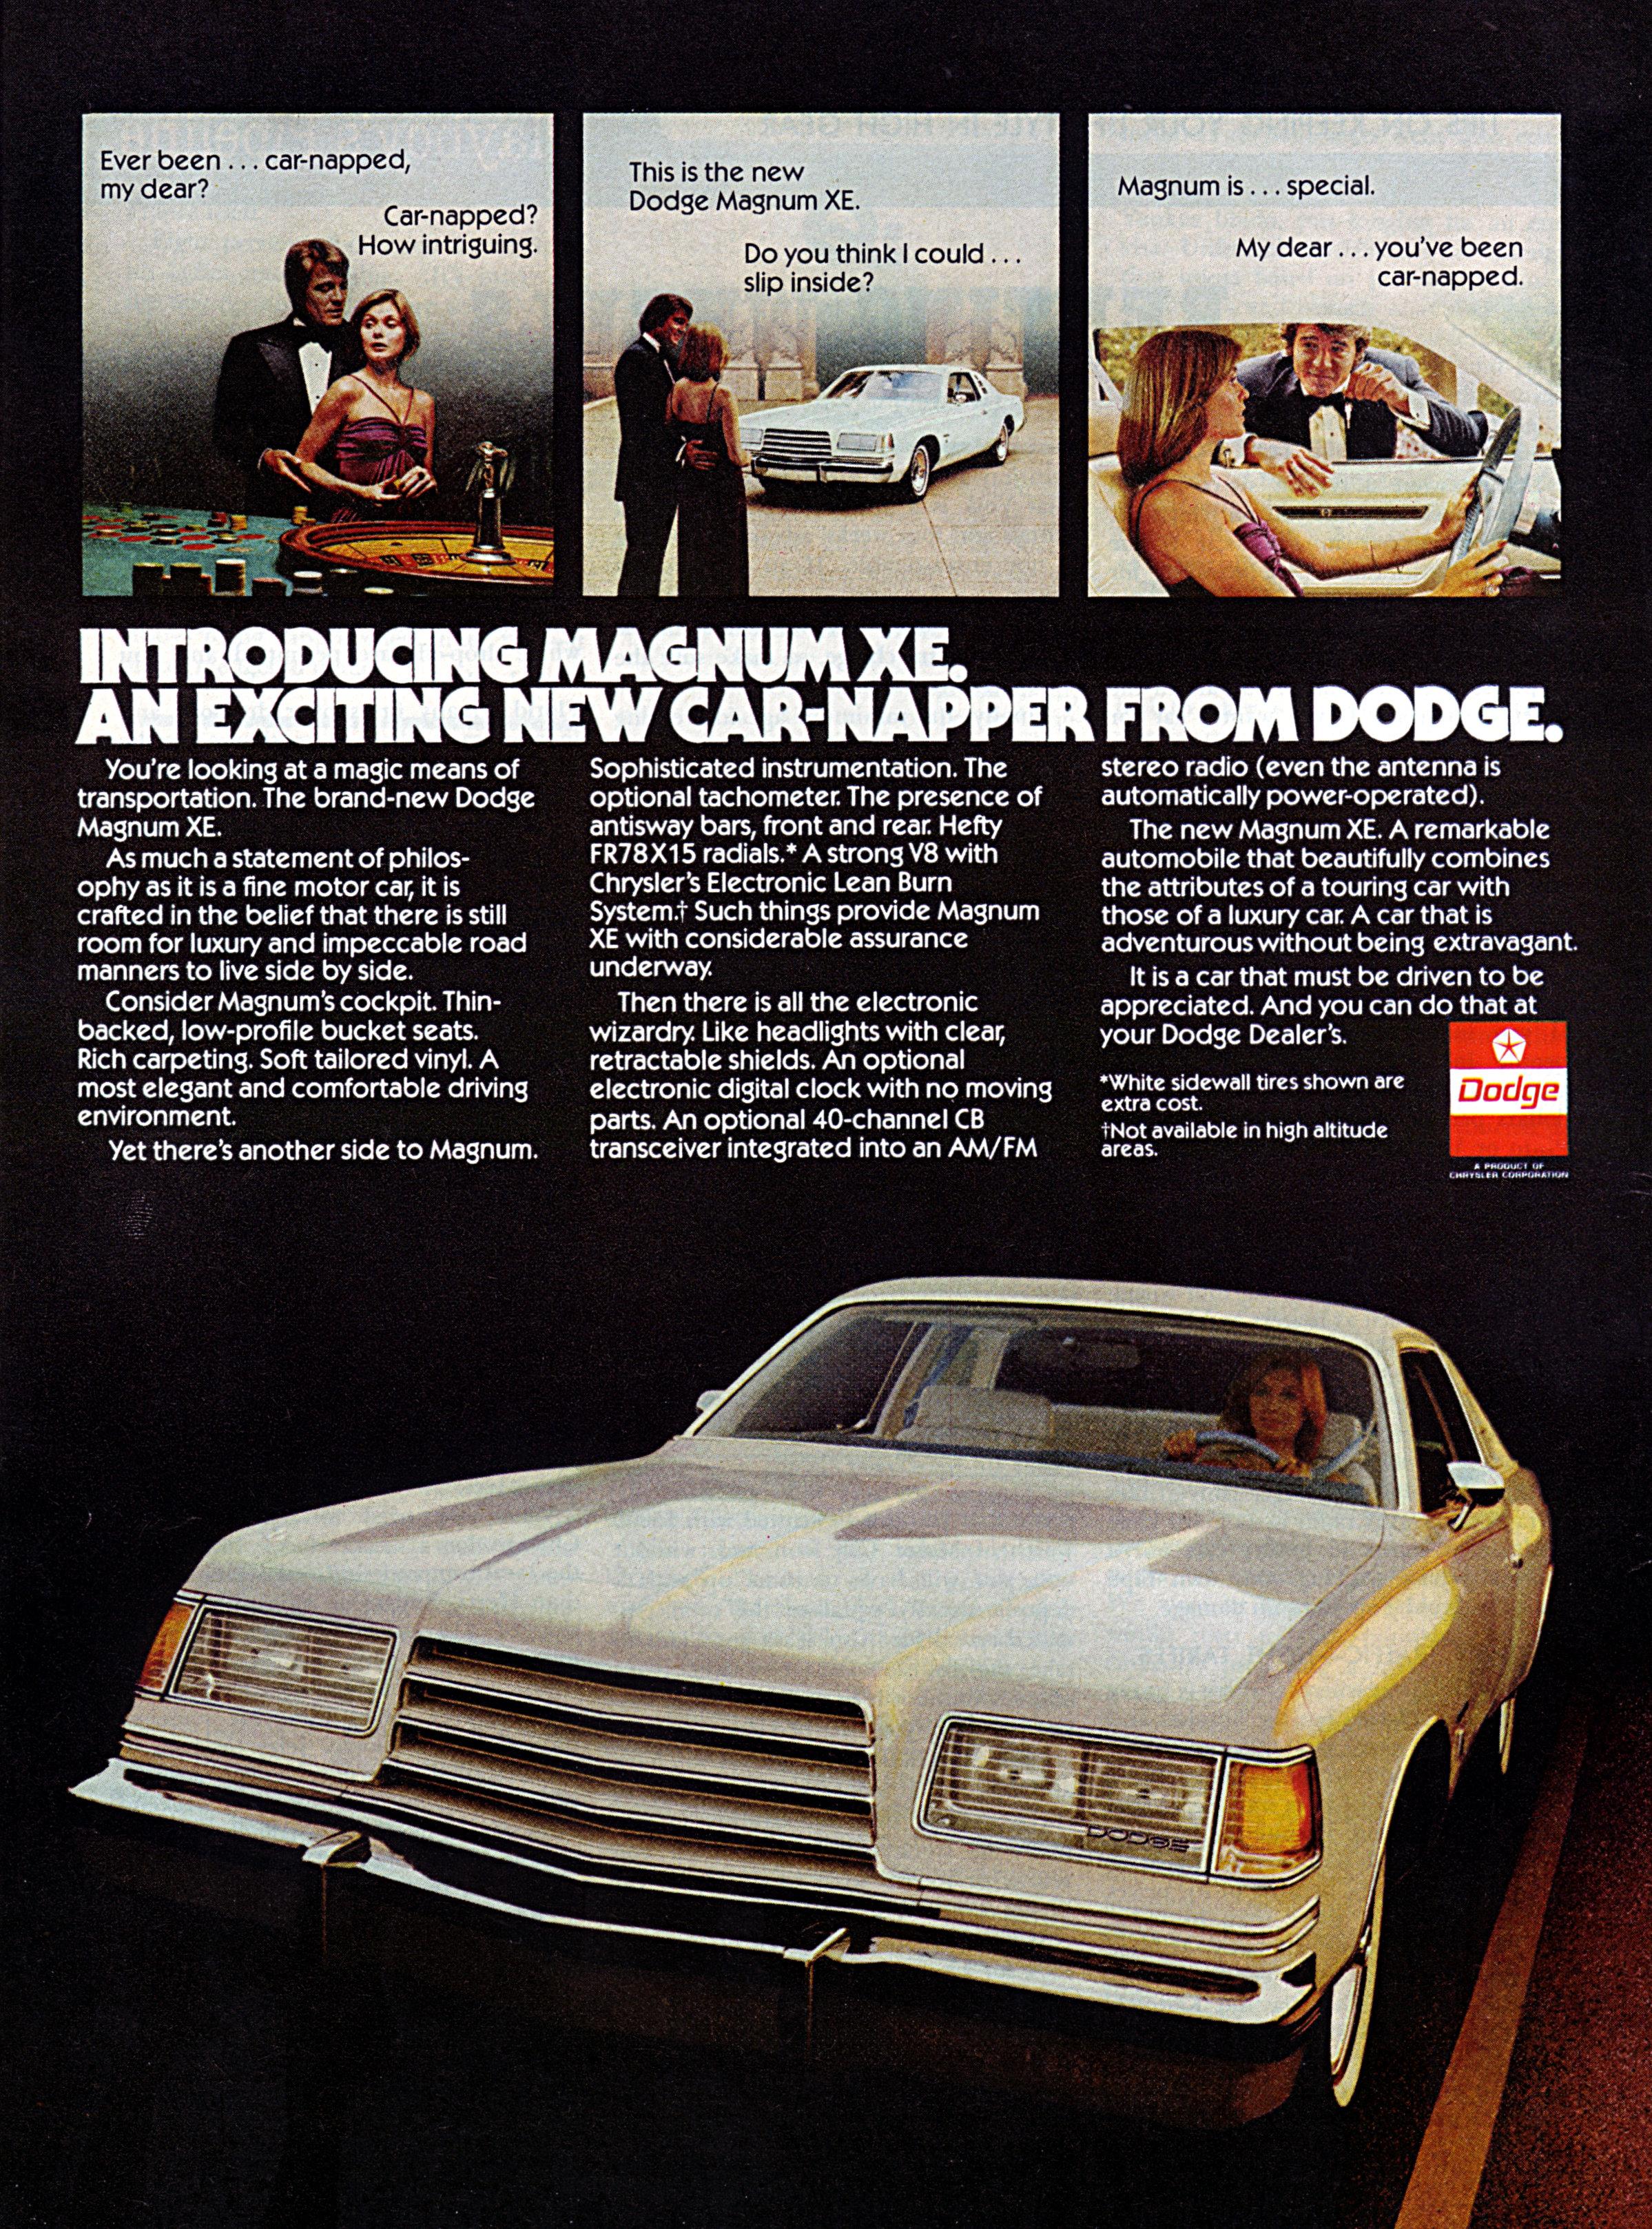 Dodge Magnum Xe Edit on 1978 Dodge Magnum